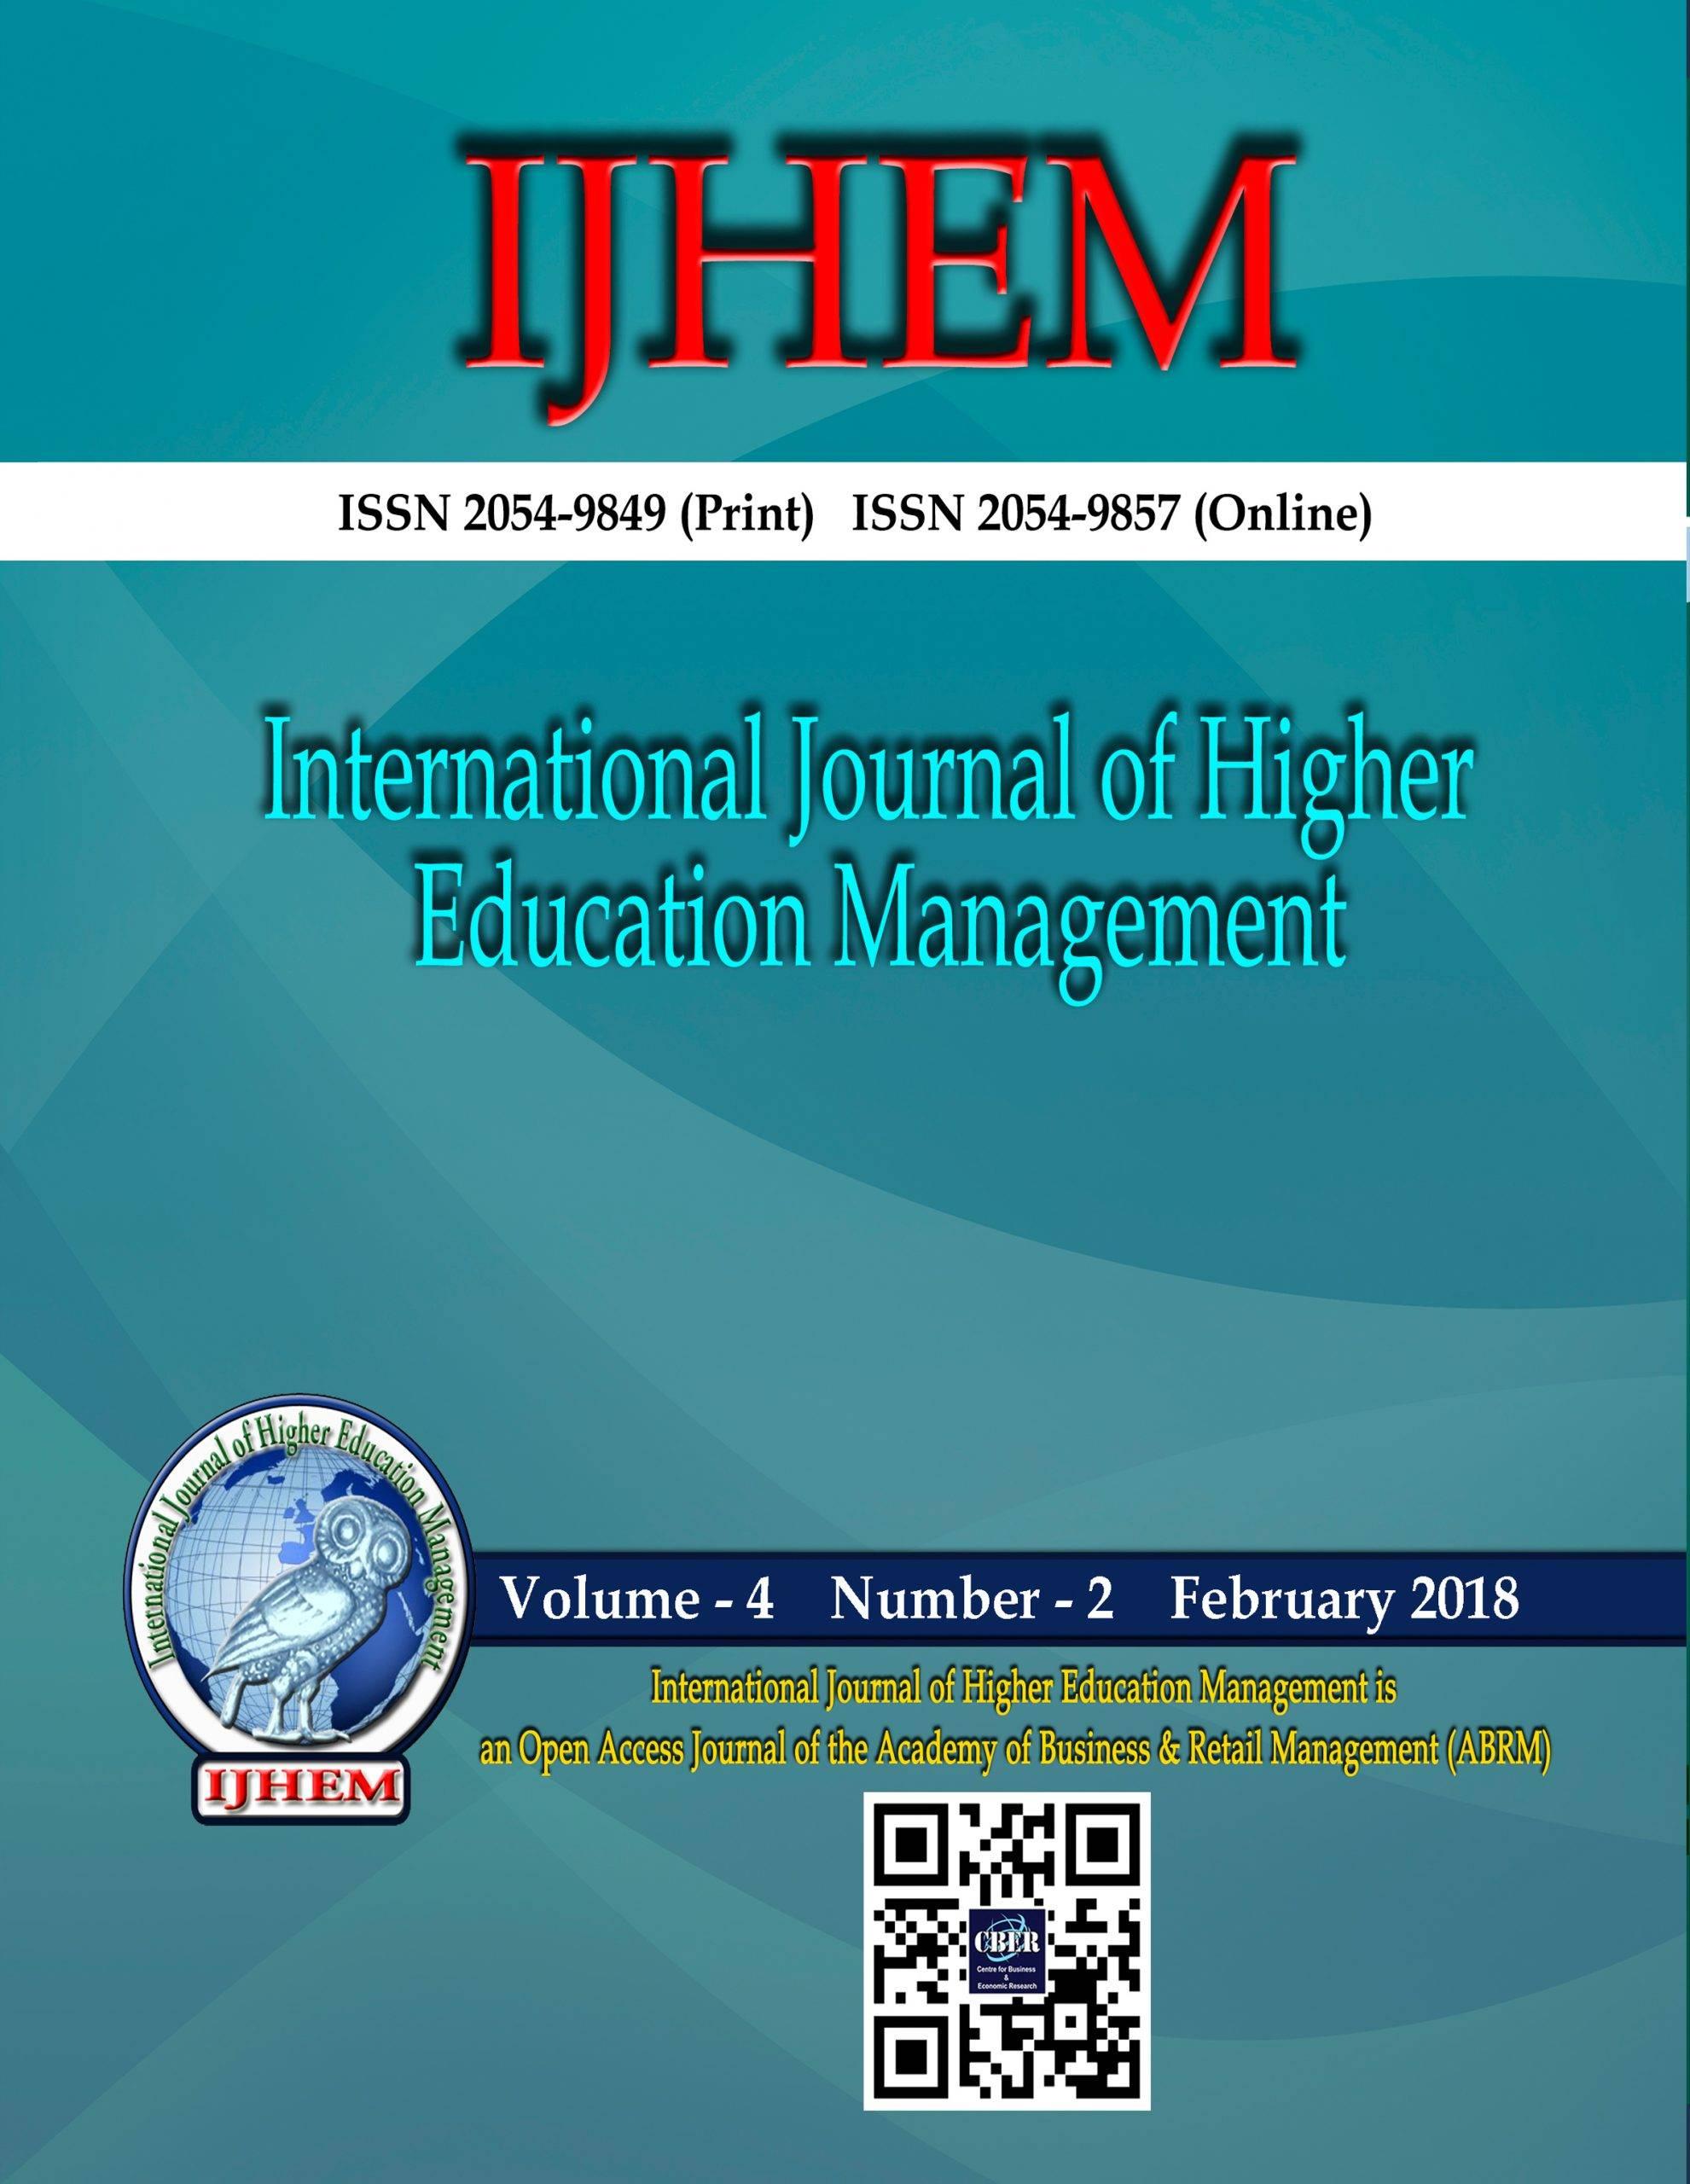 International Journal of Higher Education Management